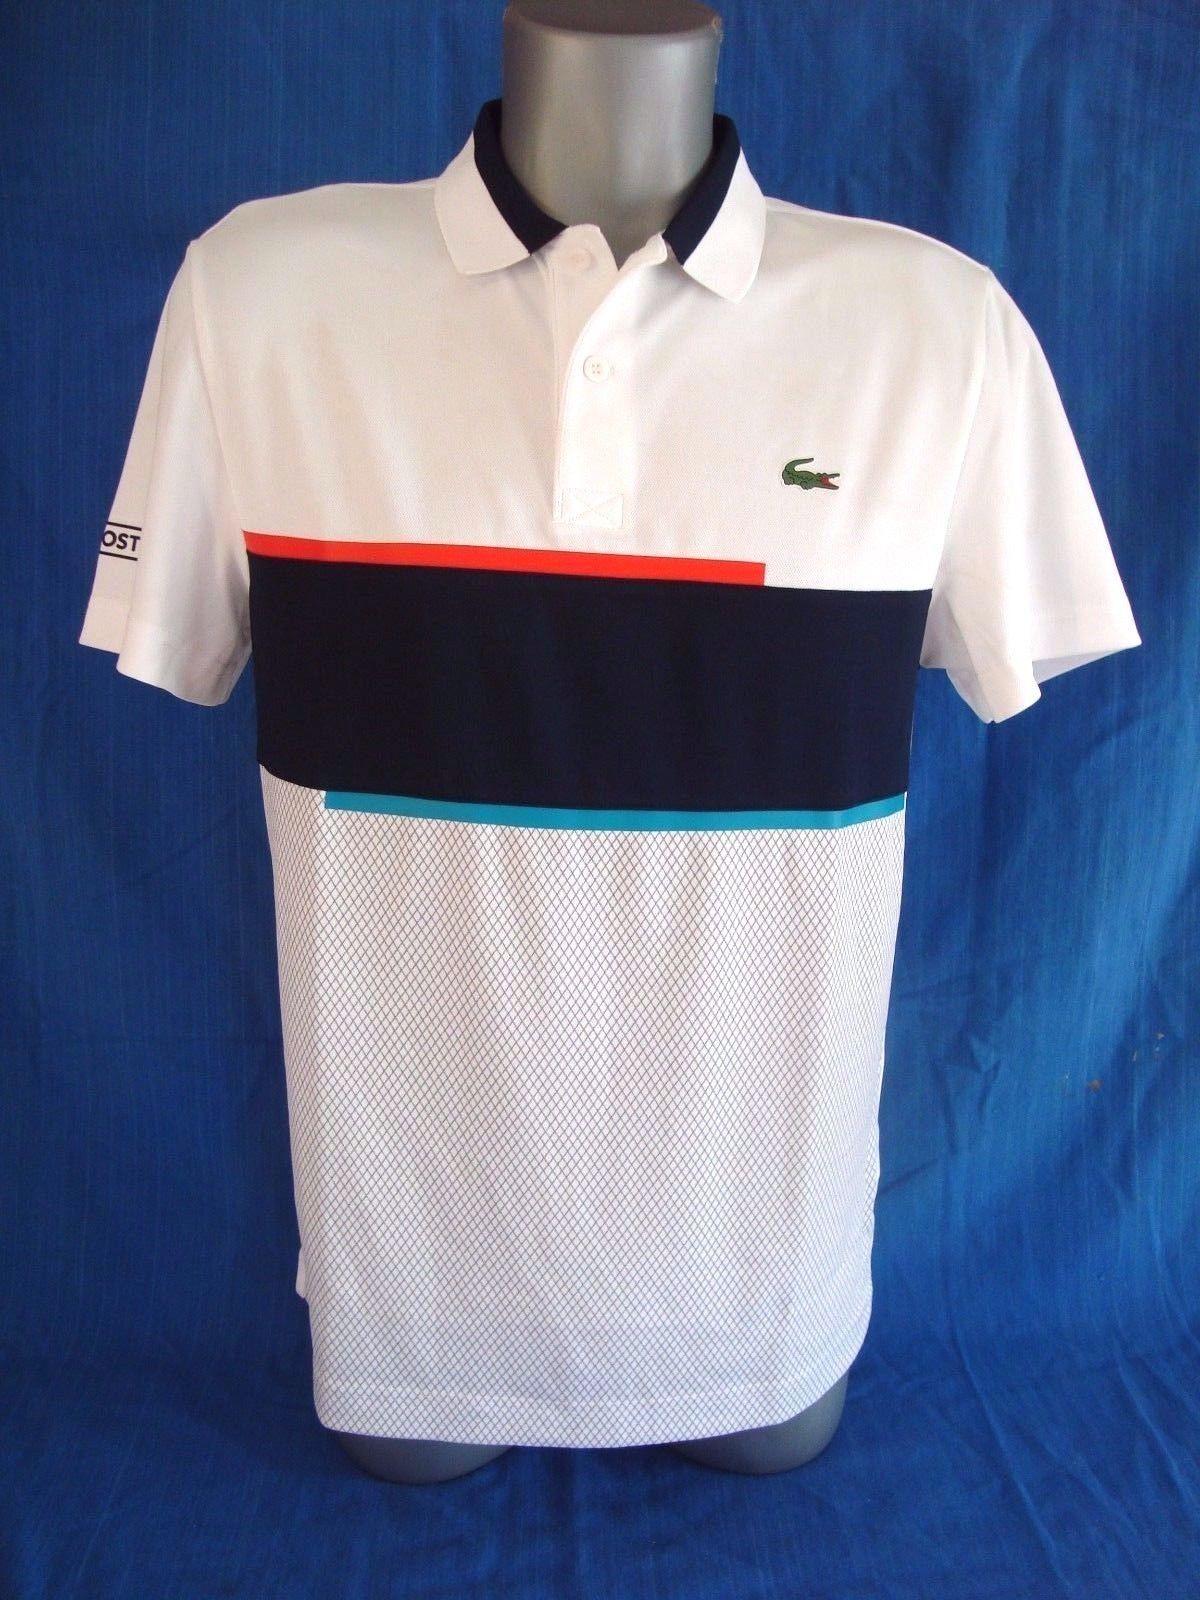 Lacoste Sport White Navy Blue Ultra Dry Mens Pique Knit Tennis Polo Shirt New Polo Shirt Lacoste Sport Tennis Polo